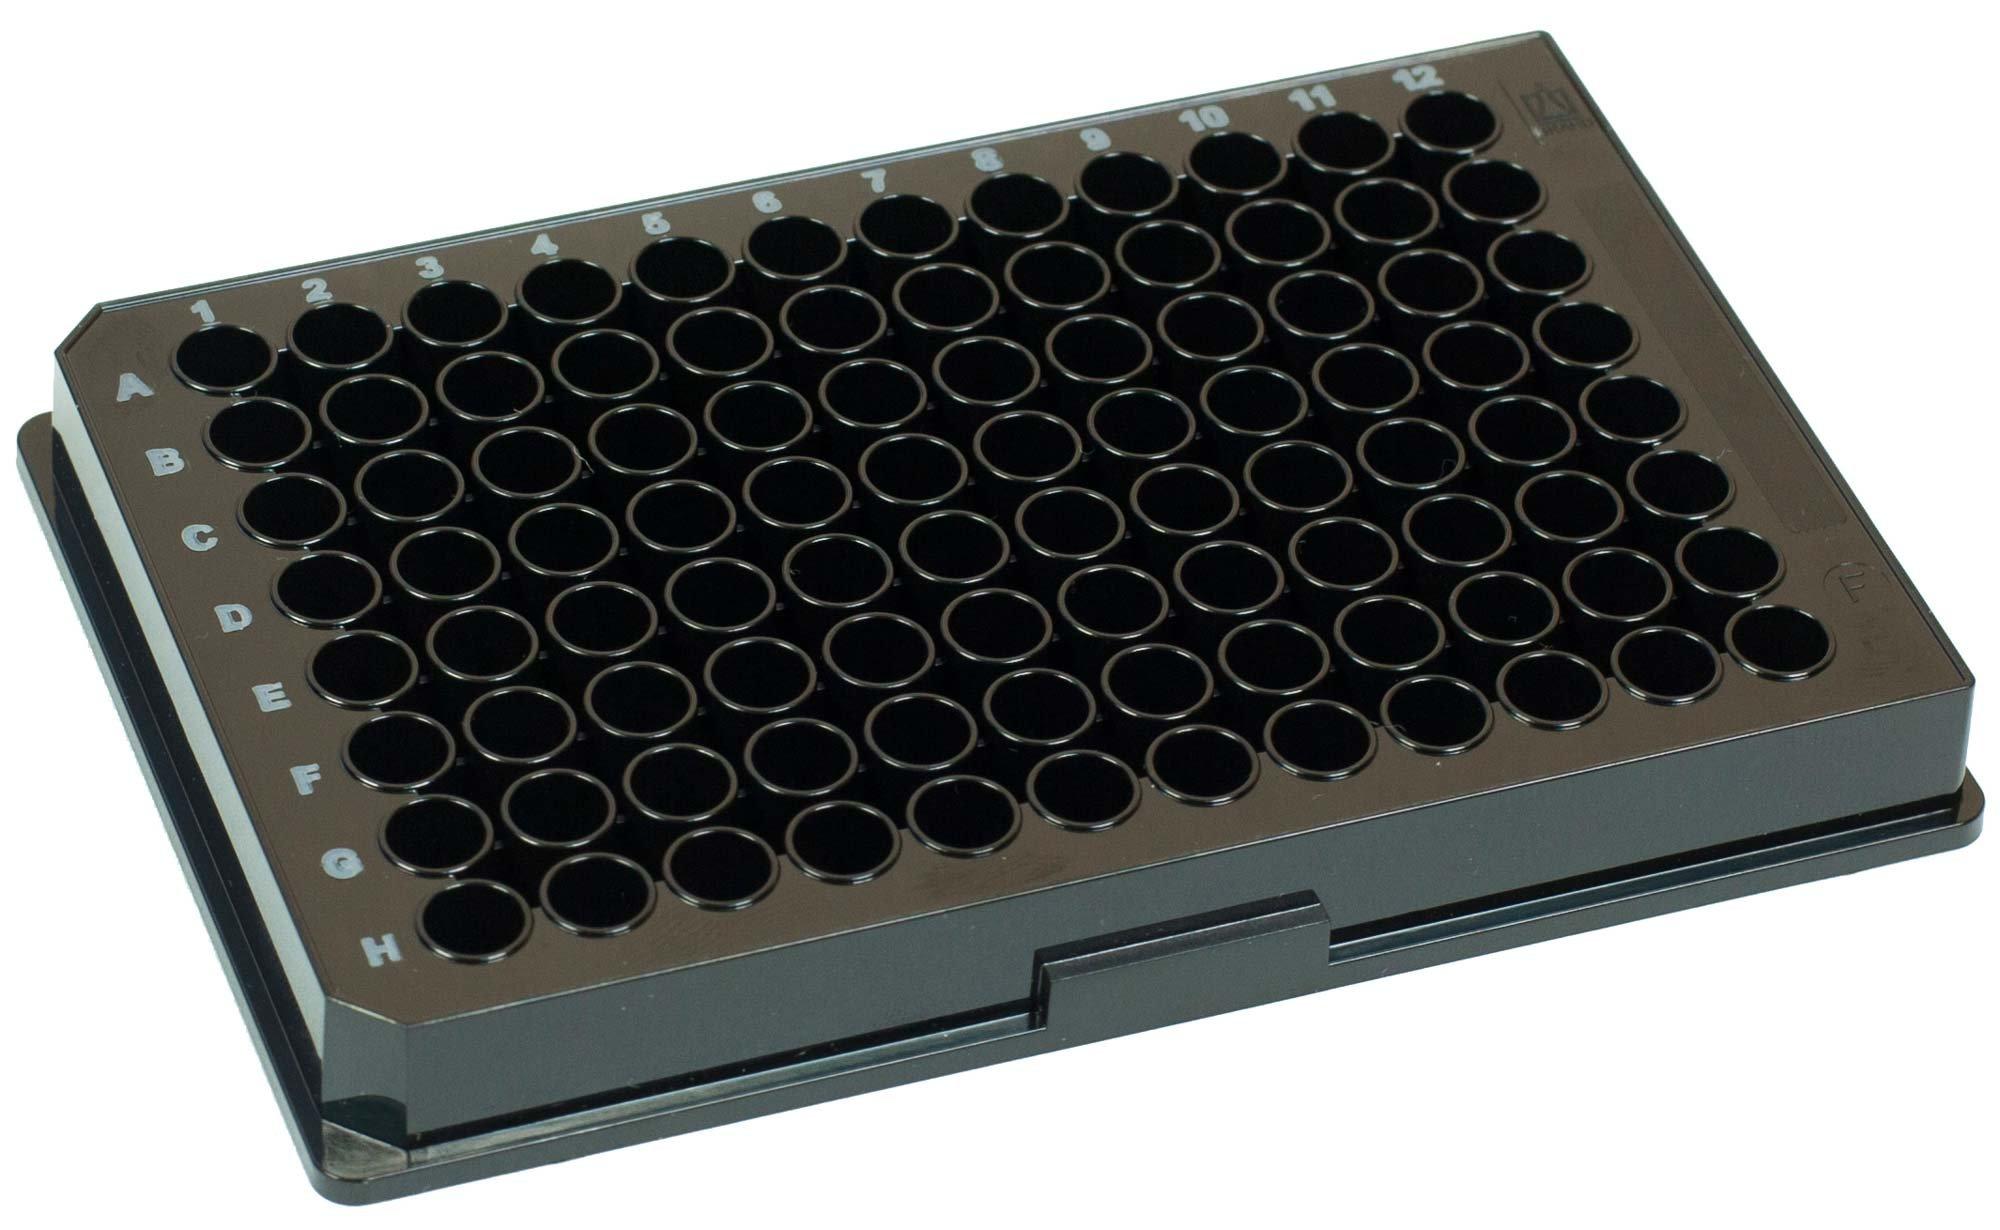 BRANDplates pureGrade PS Non-Treated Non-Sterile Surface 96-Well Plate - Black, F-Bottom